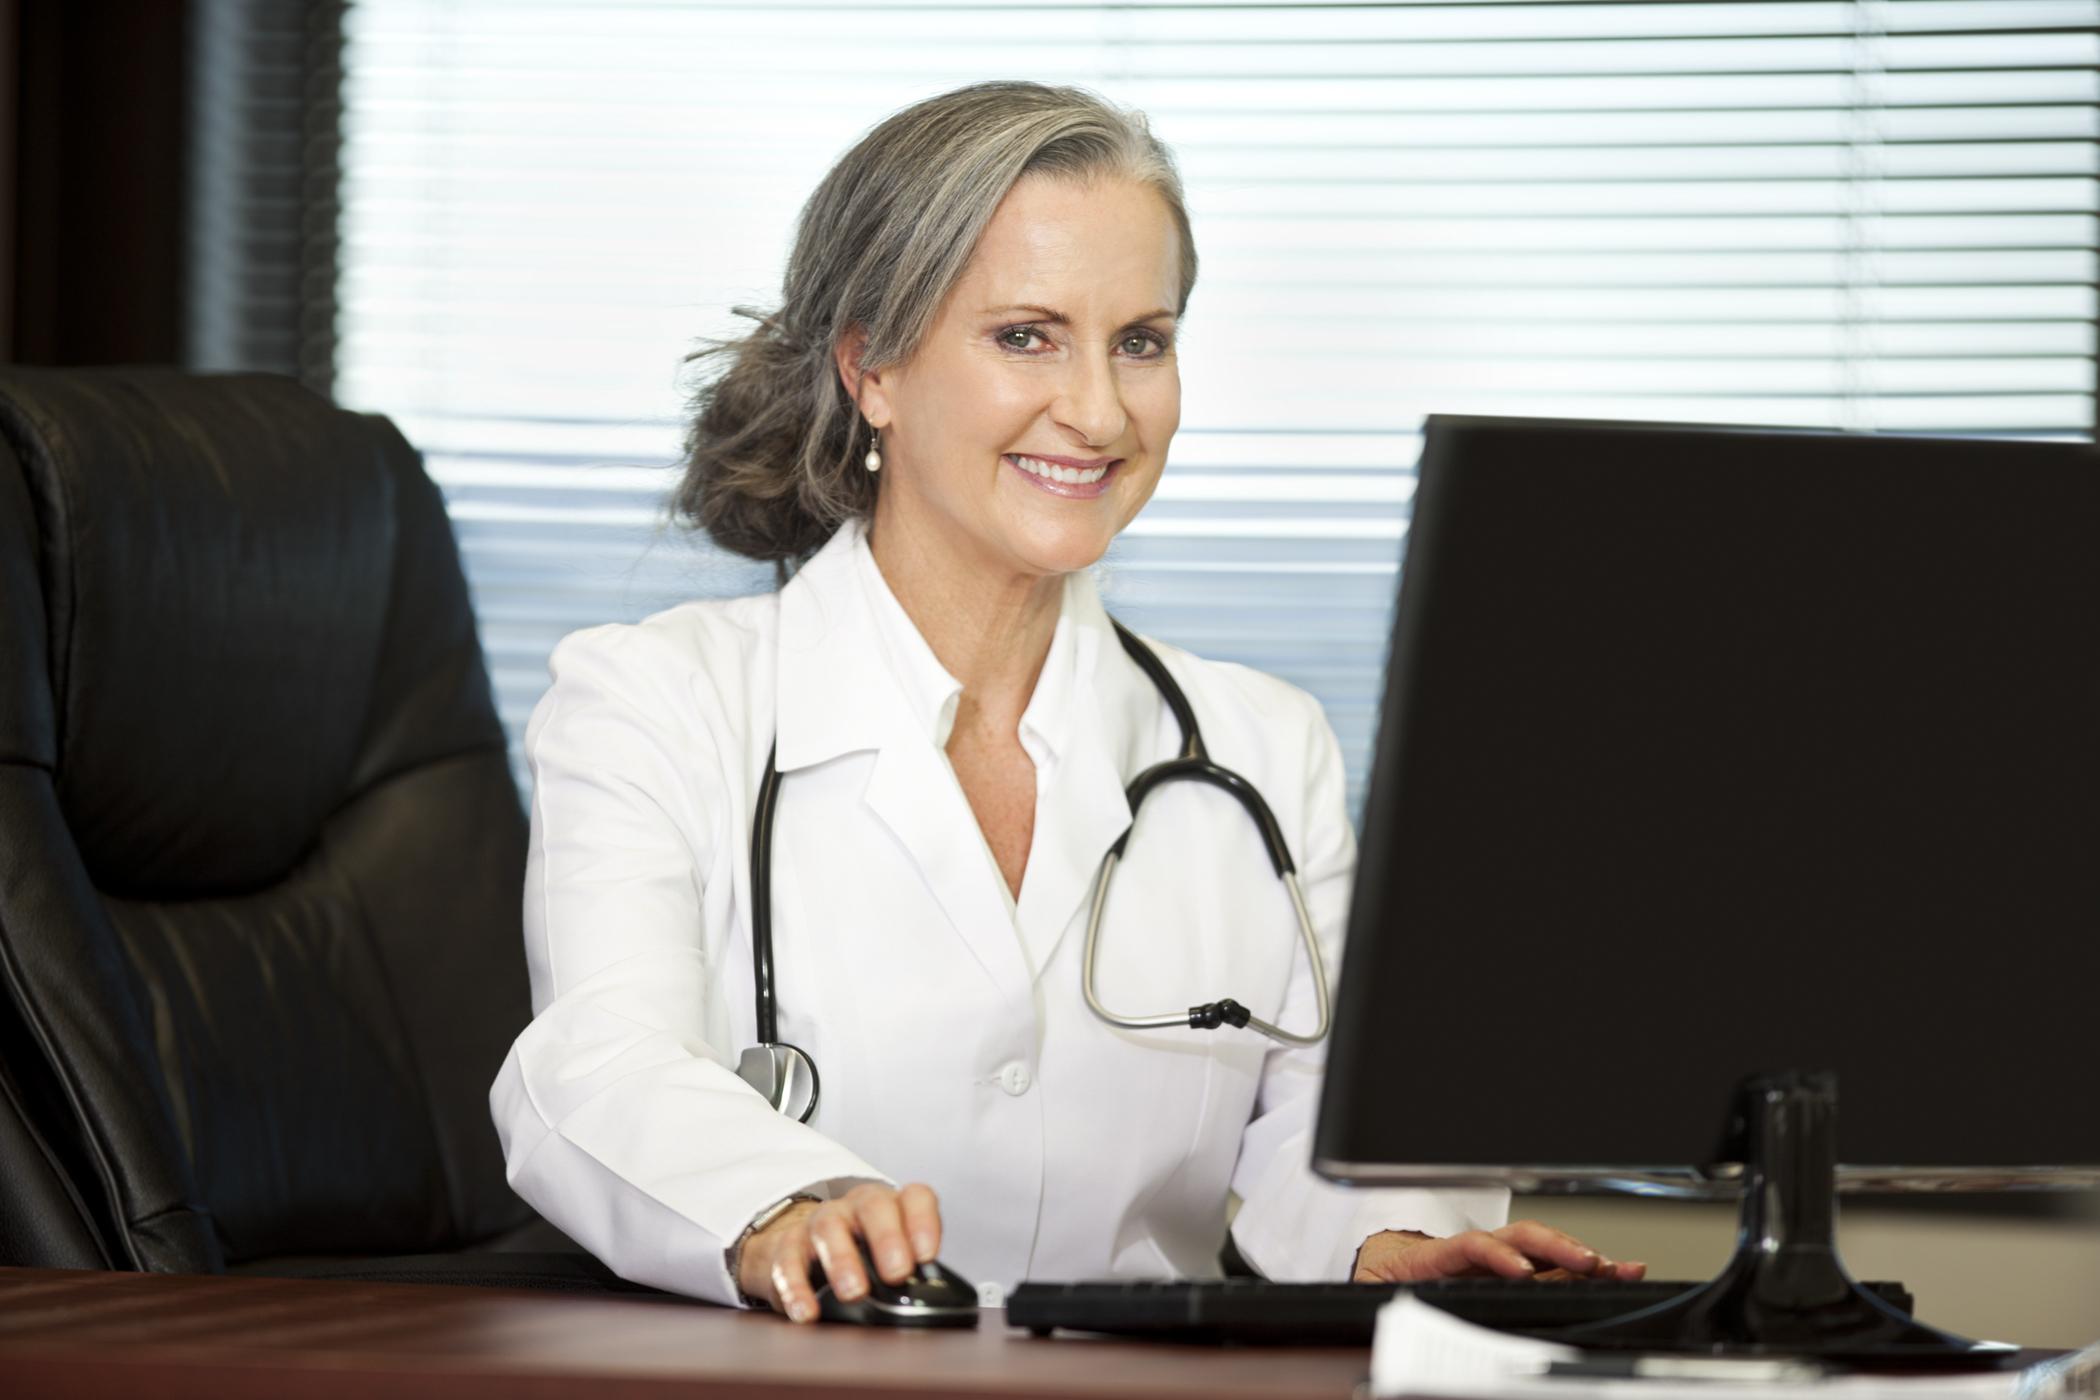 Market Snapshot: Doctor of Nursing Practice